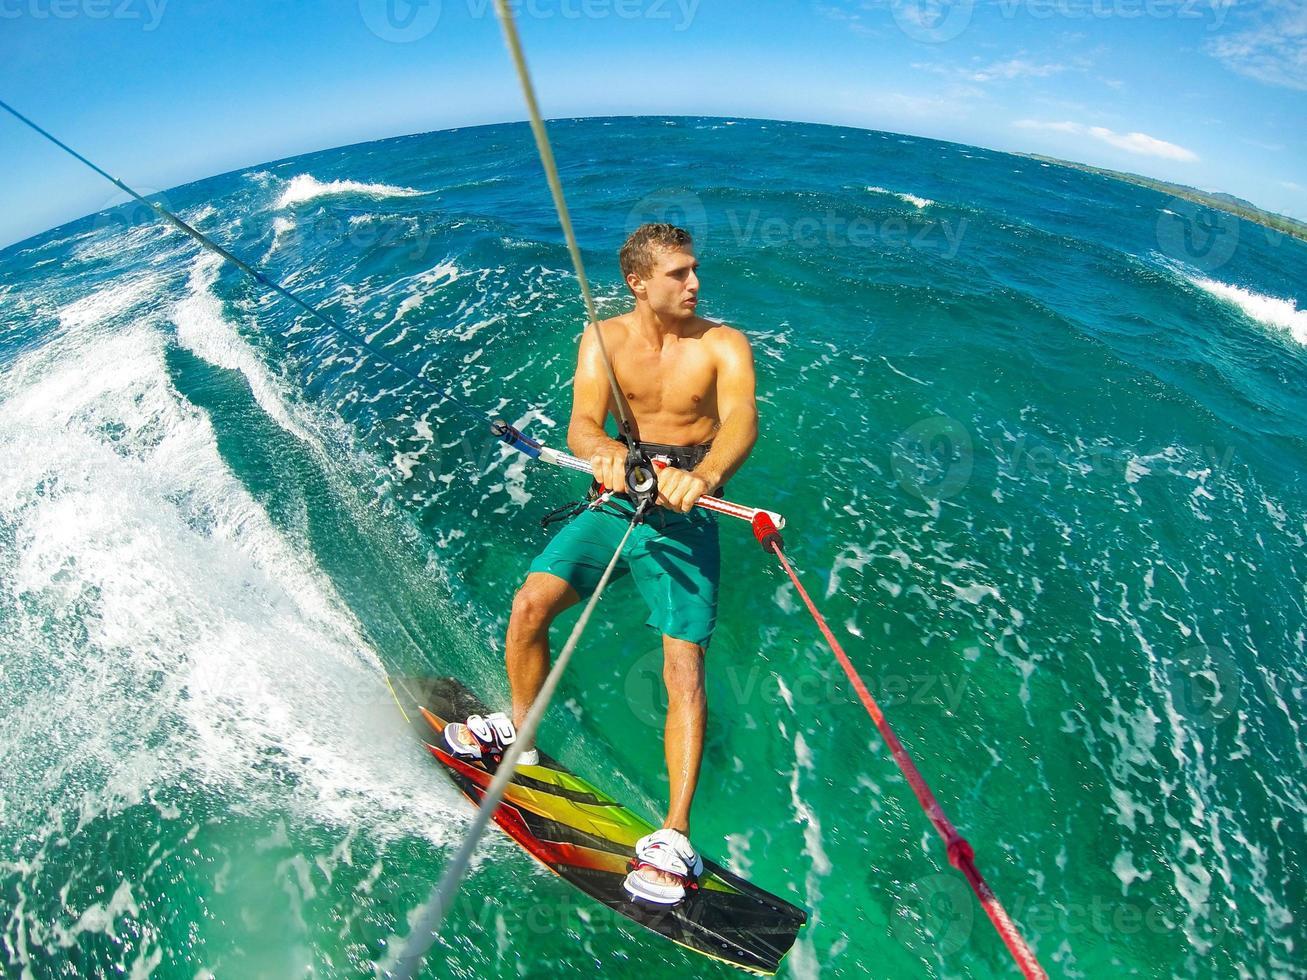 deporte extremo, kiteboarding foto